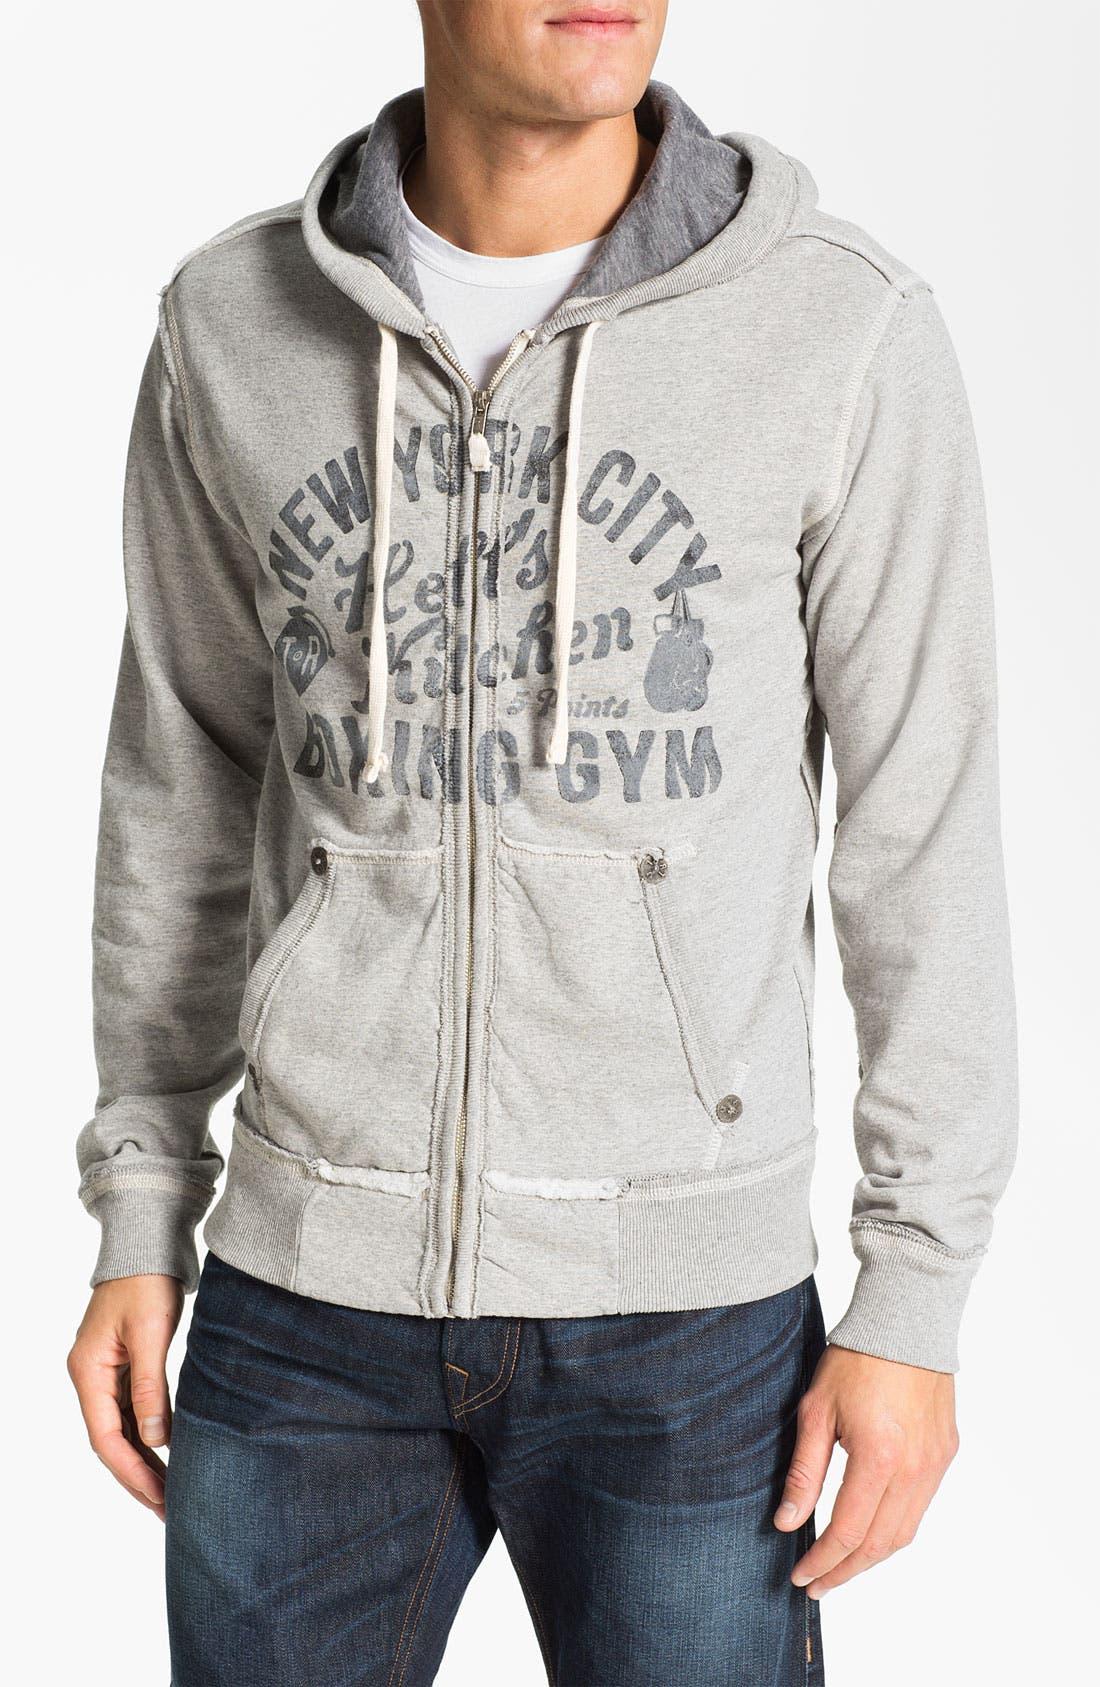 Main Image - True Religion Brand Jeans 'Hell's Kitchen' Graphic Zip Hoodie